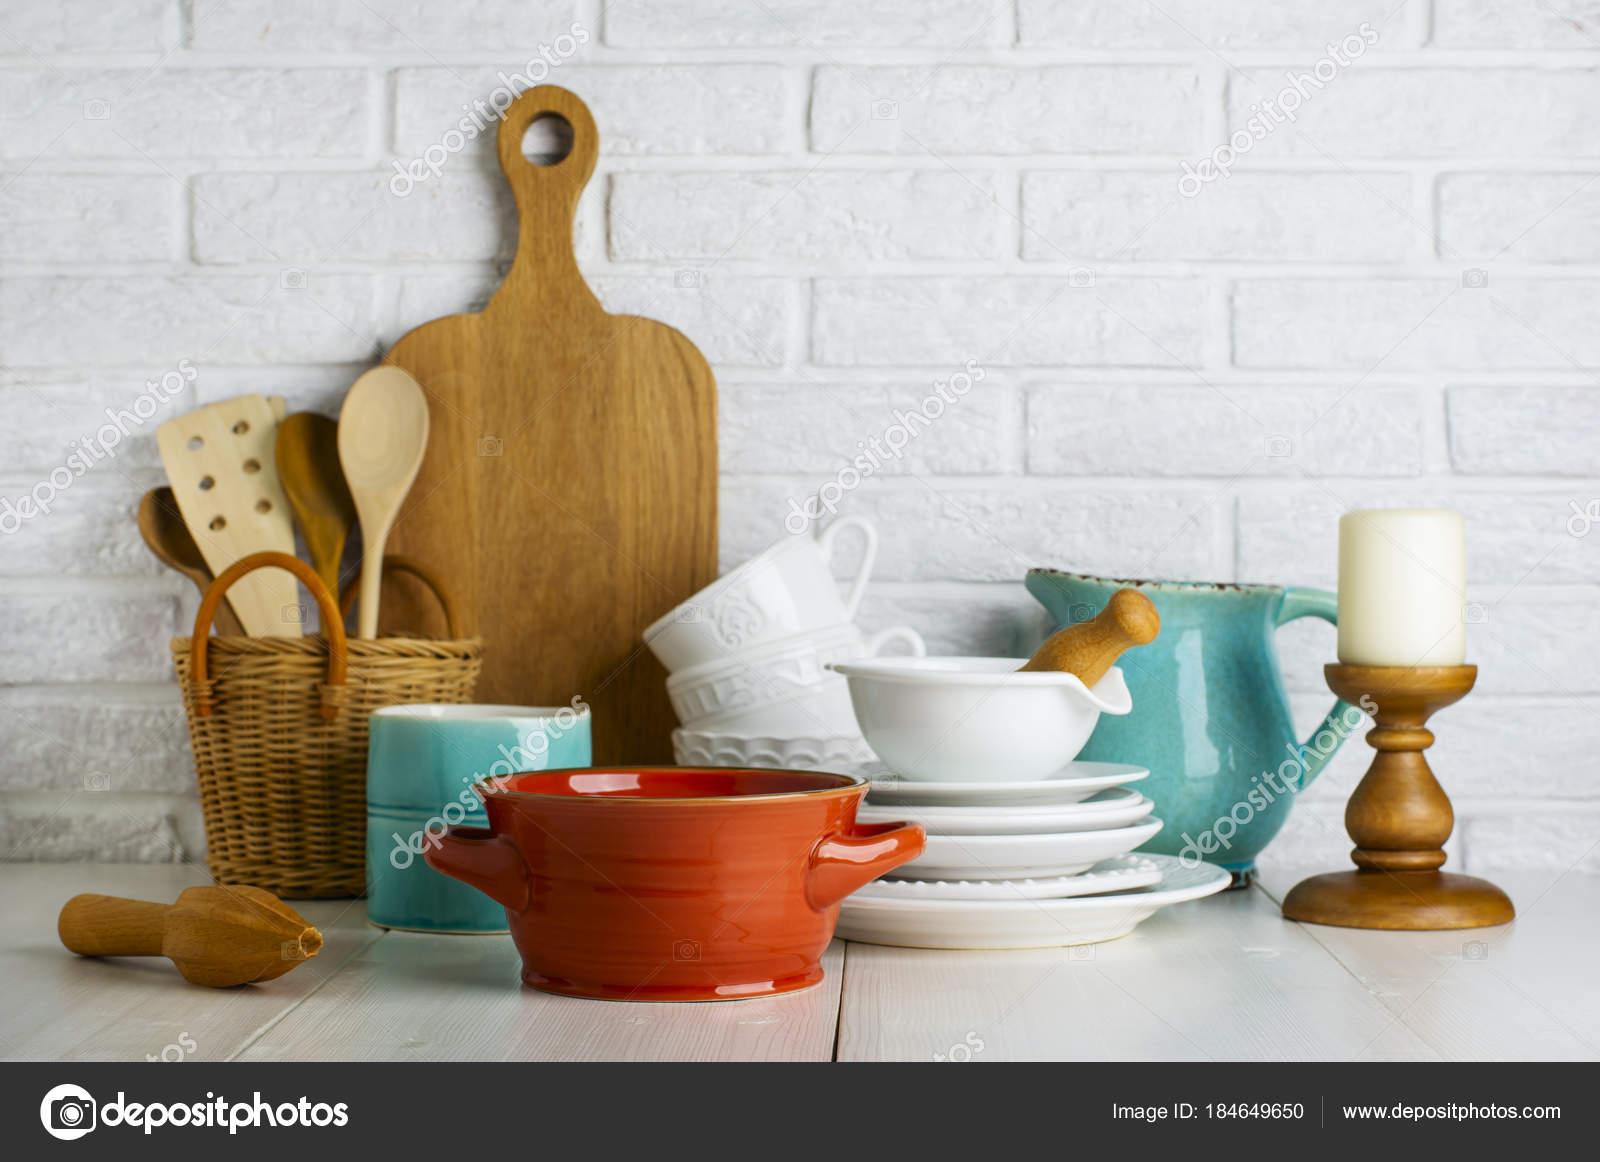 Ustensiles cuisine sur tableau blanc cuisine nature morte for Tableau blanc cuisine